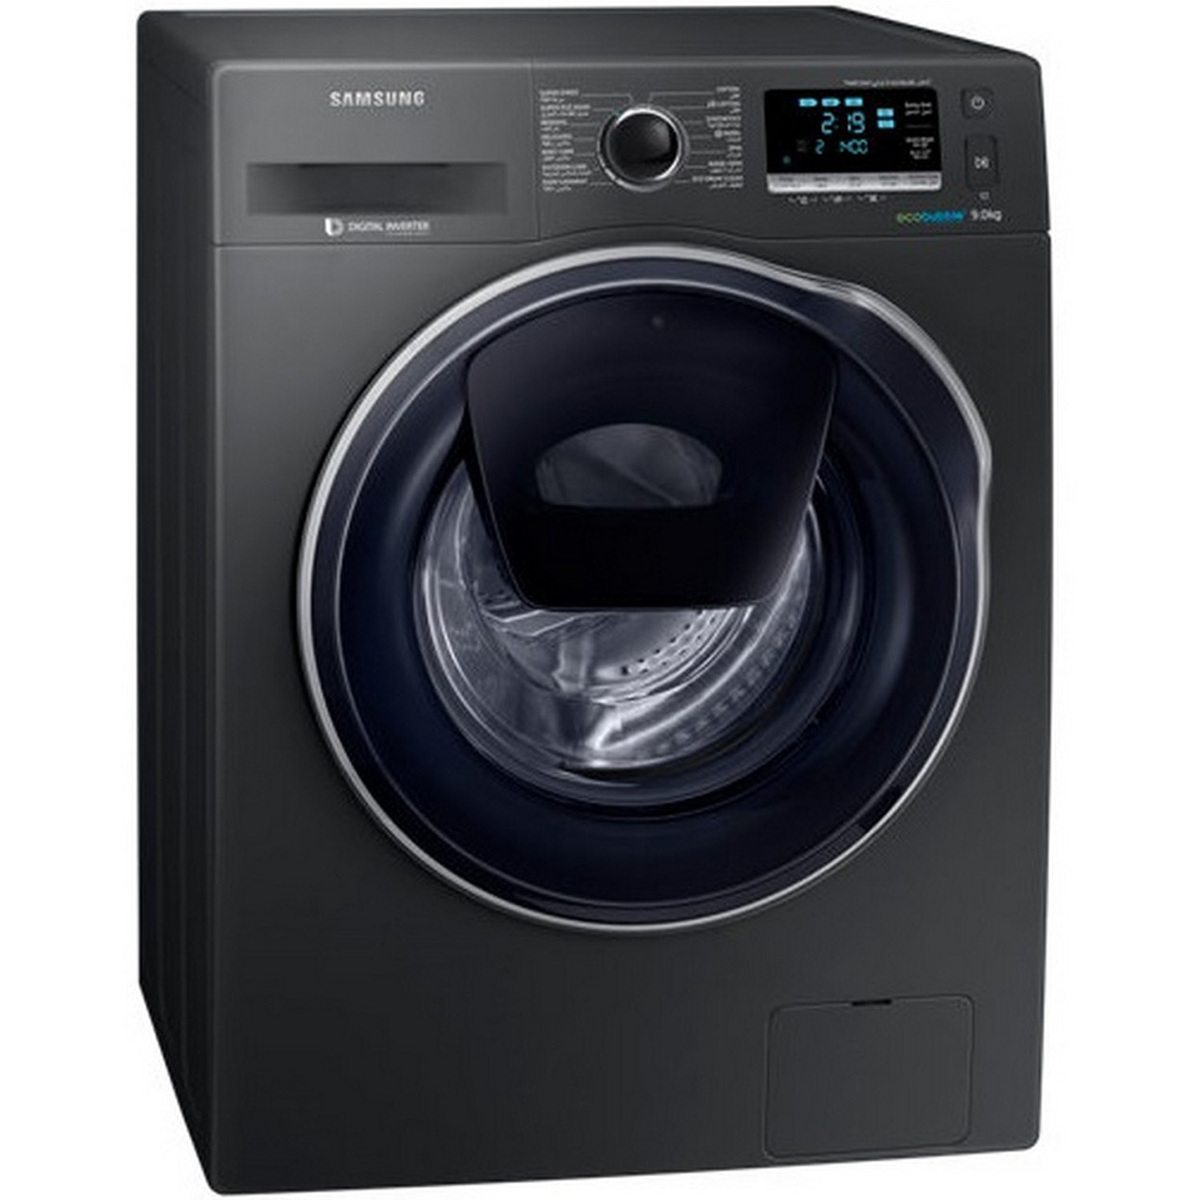 Buy Samsung Front Load Washing Machine WW90K6410QX/SG 9Kg - F/L Auto